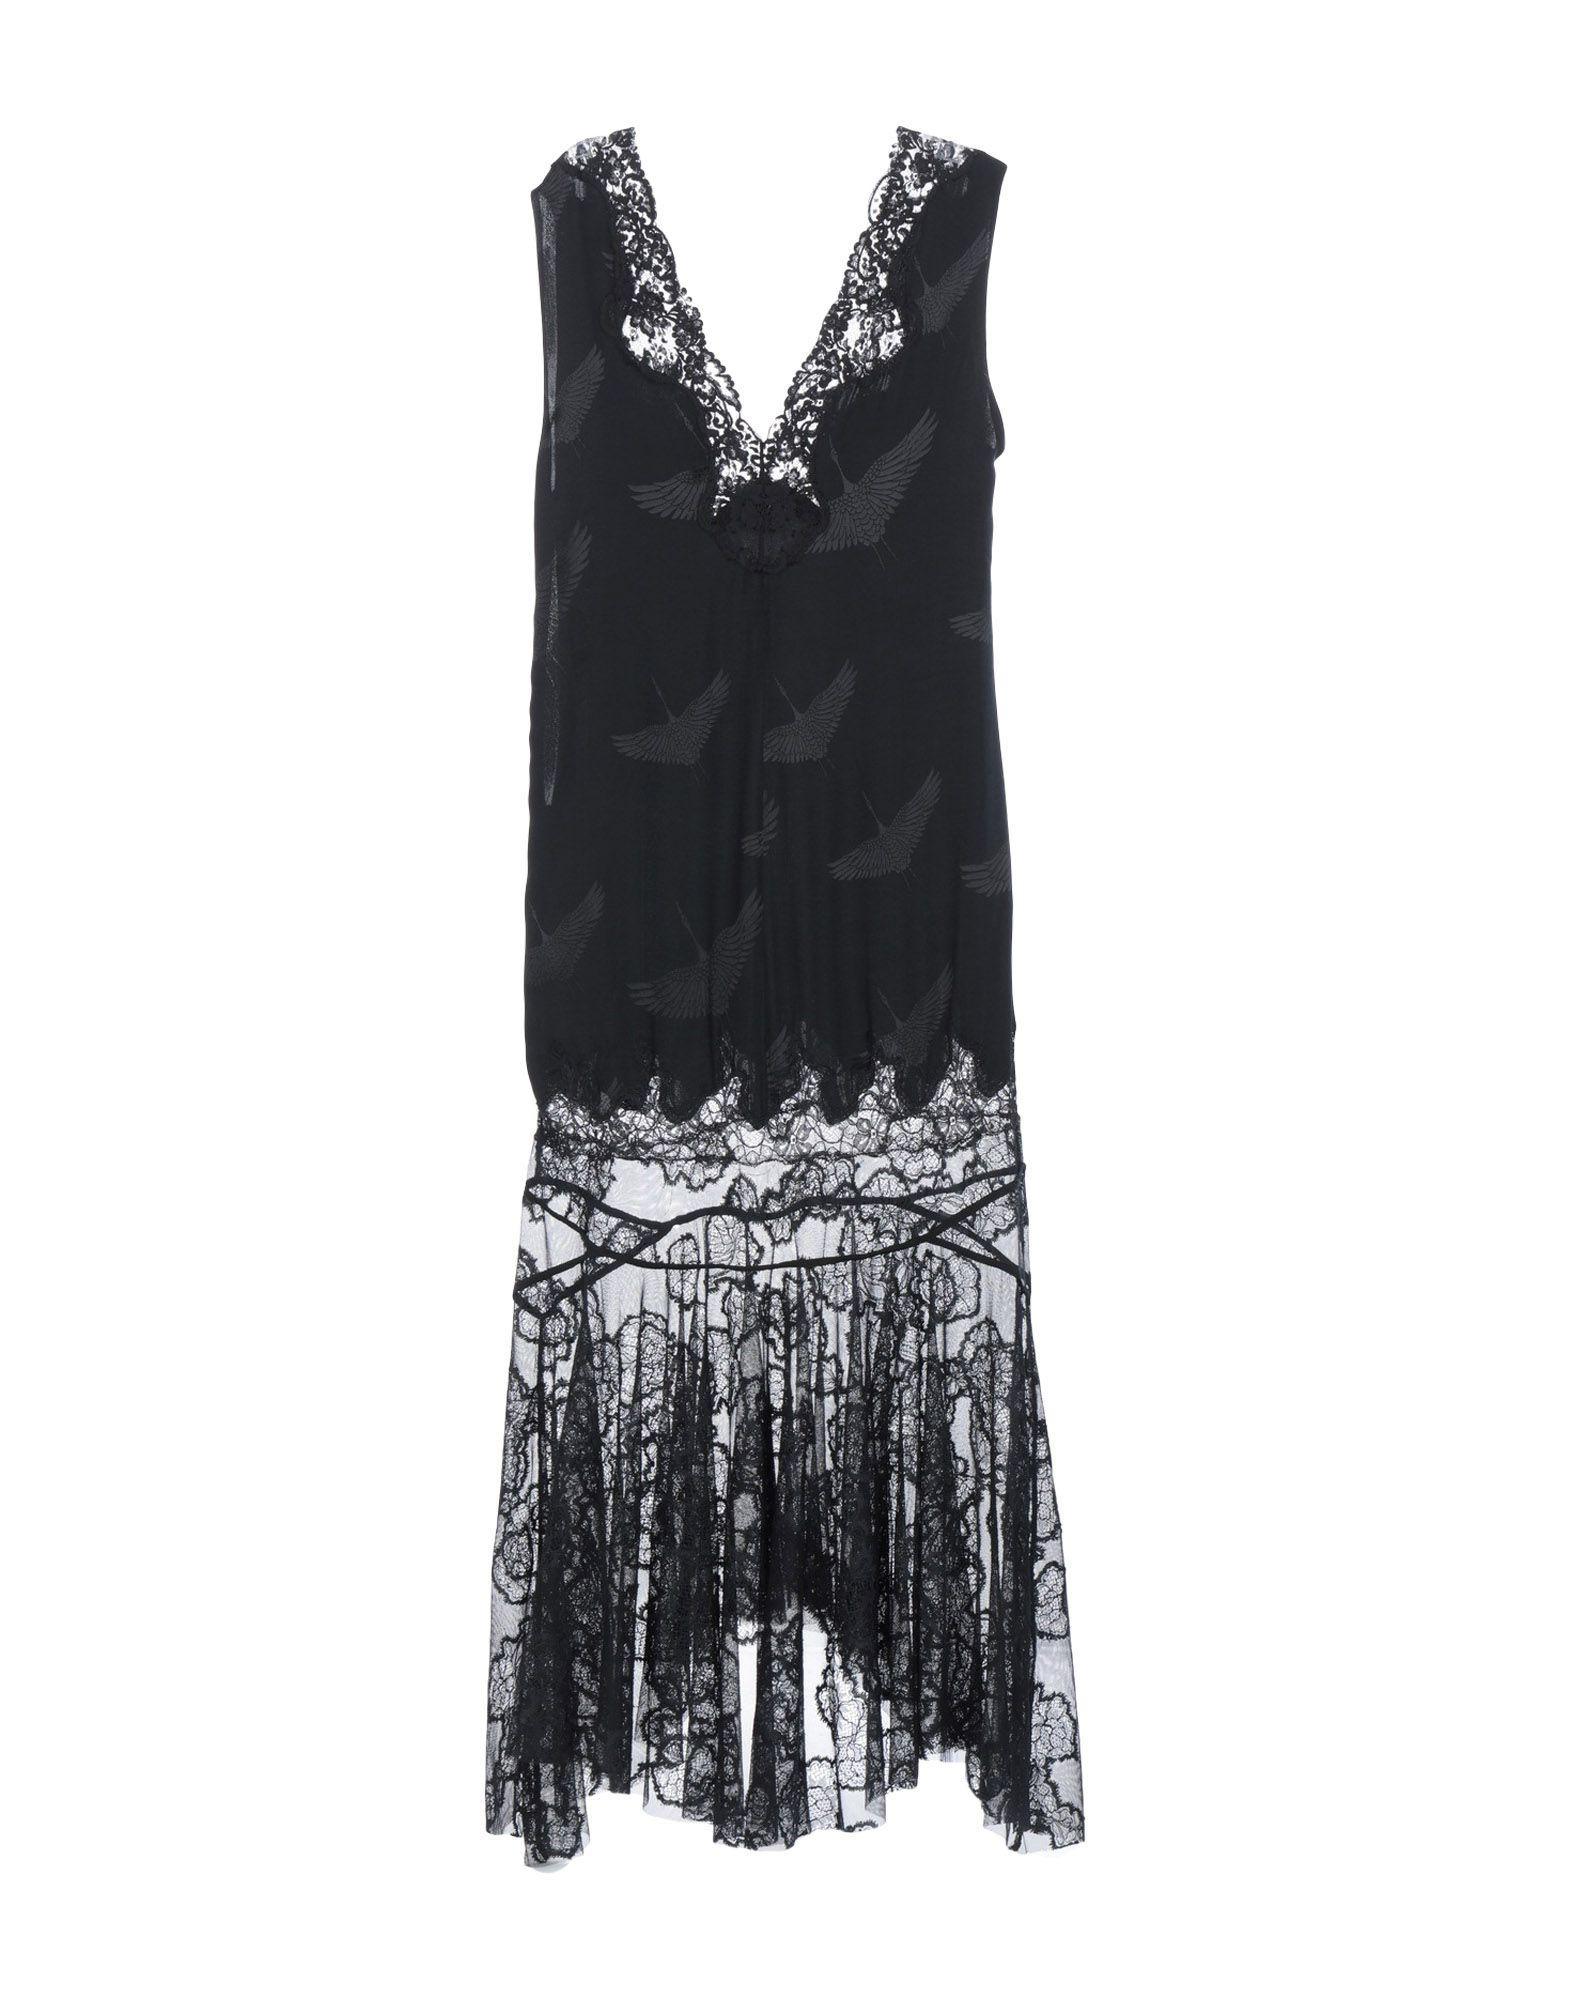 fcbdd27aa28 SANDRO WW8012C0D Длинное платье 2B08F320782 Одежда Платья ...